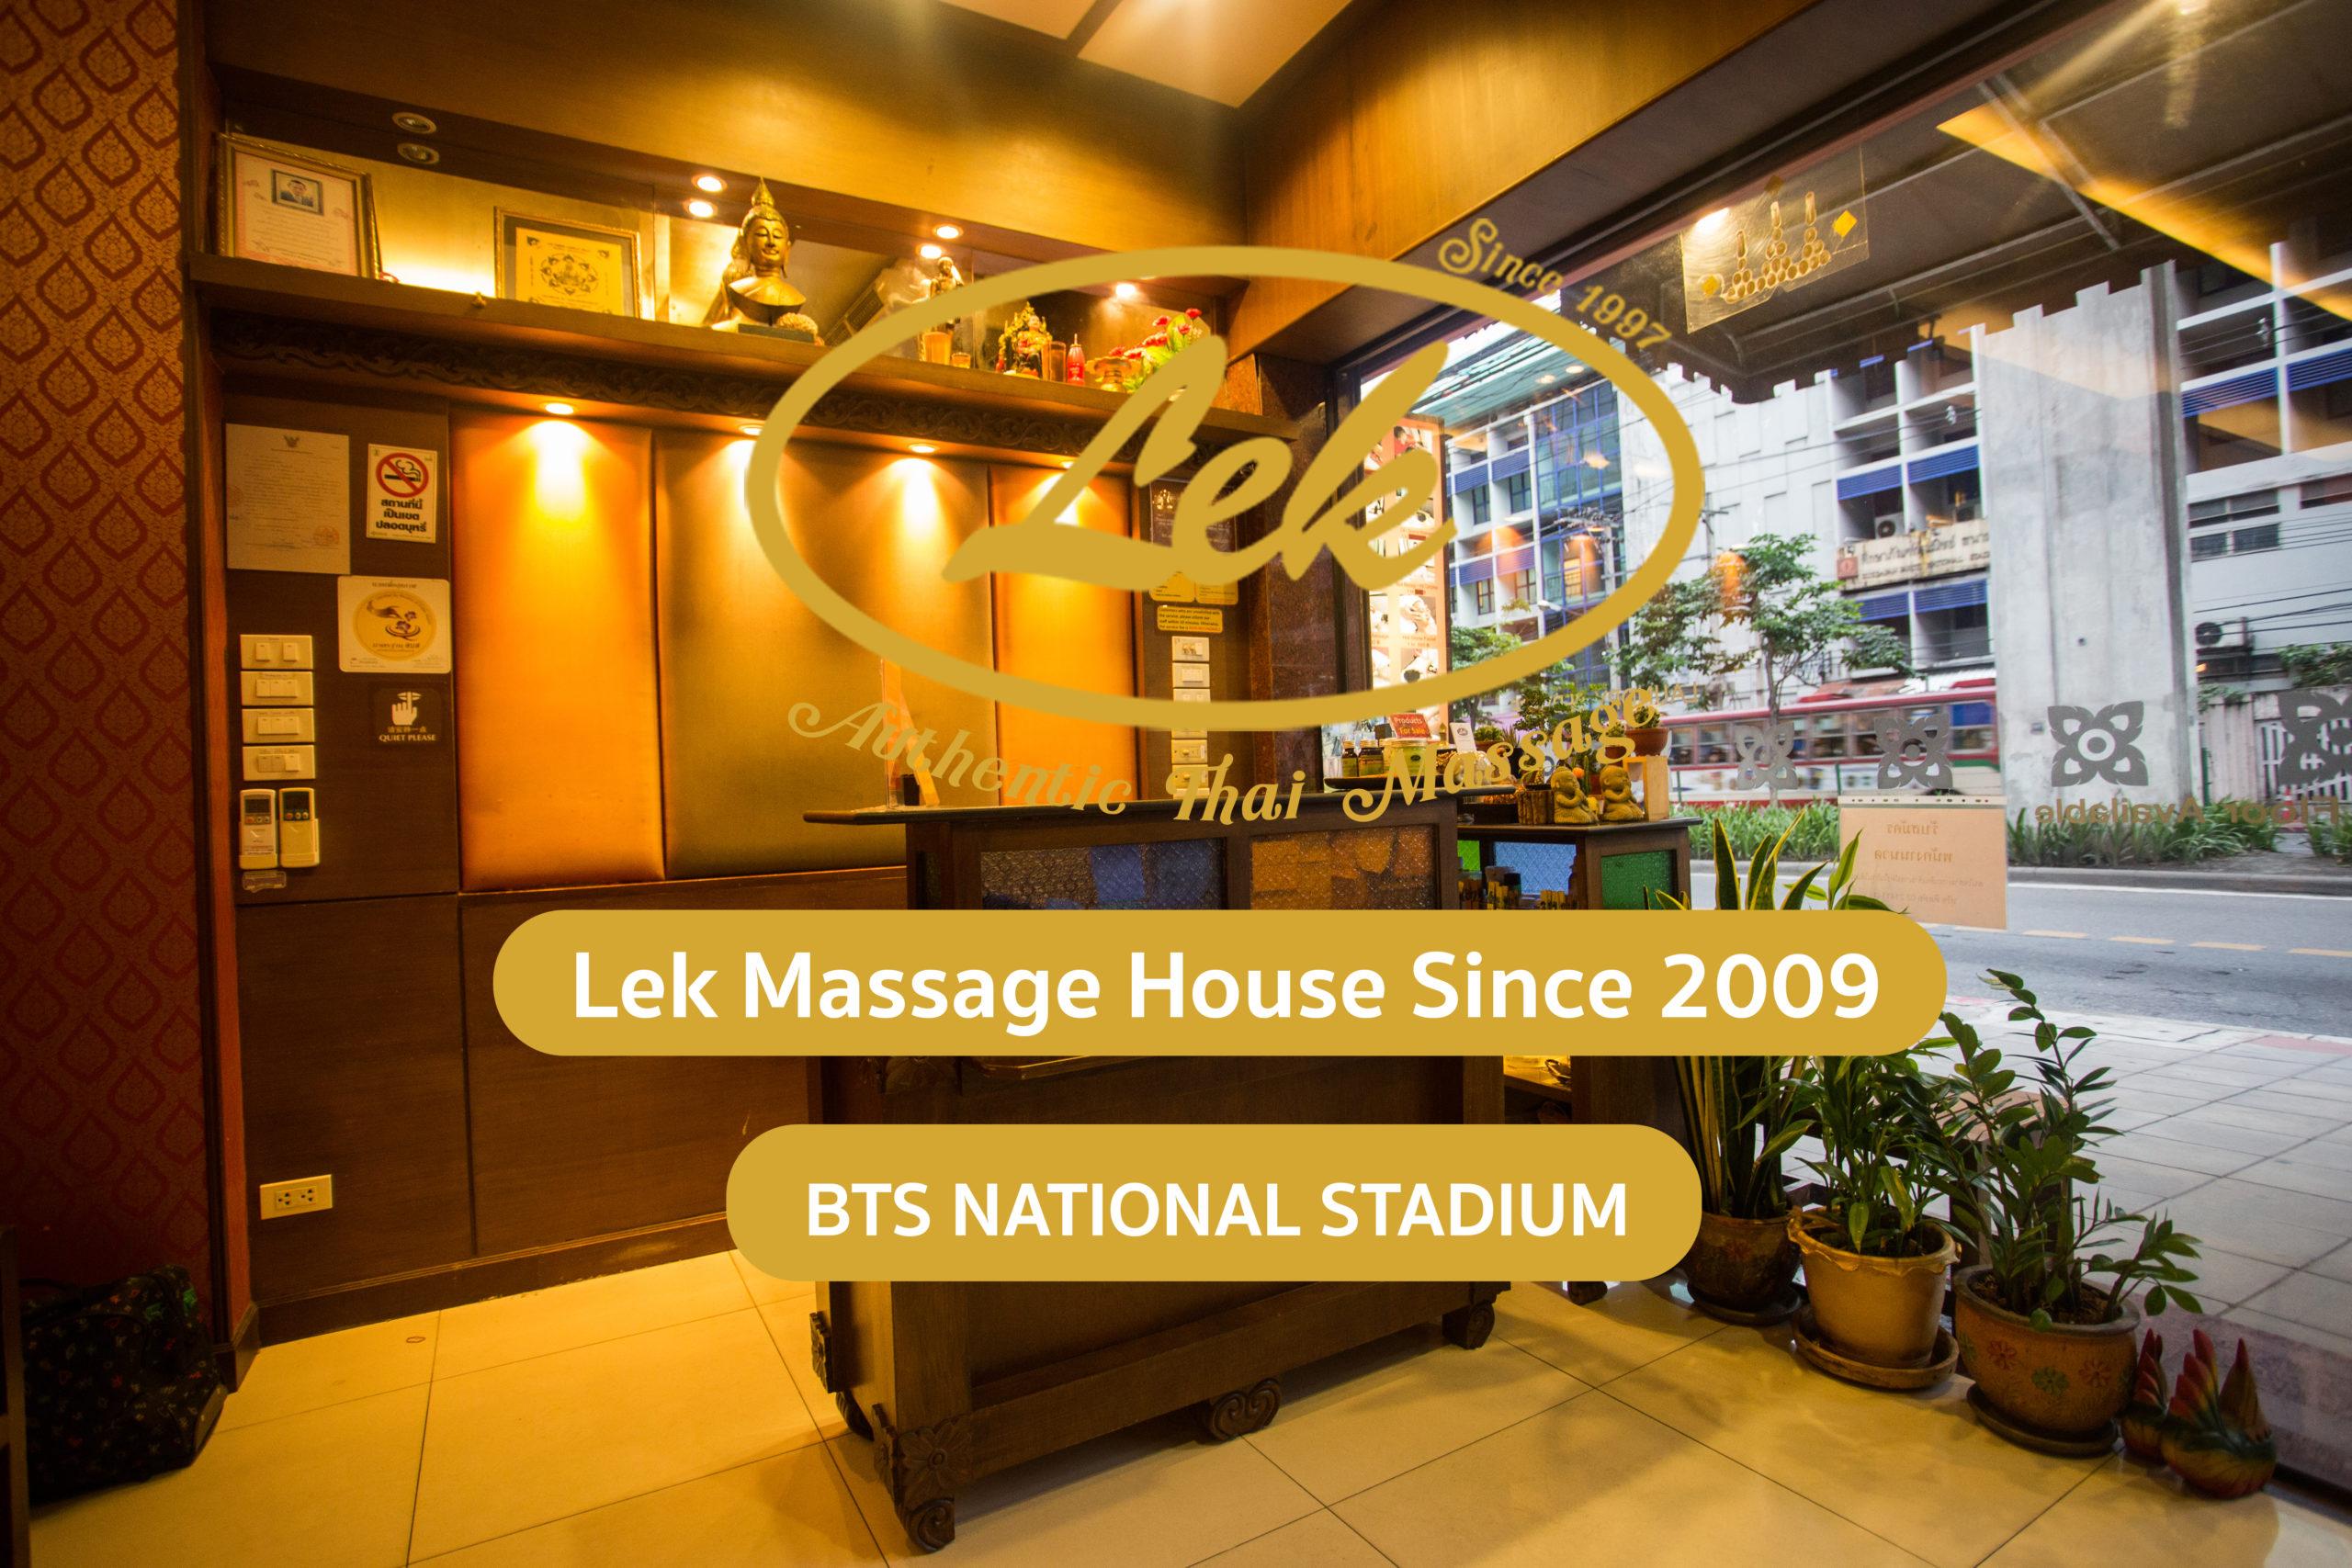 Lek Massage House